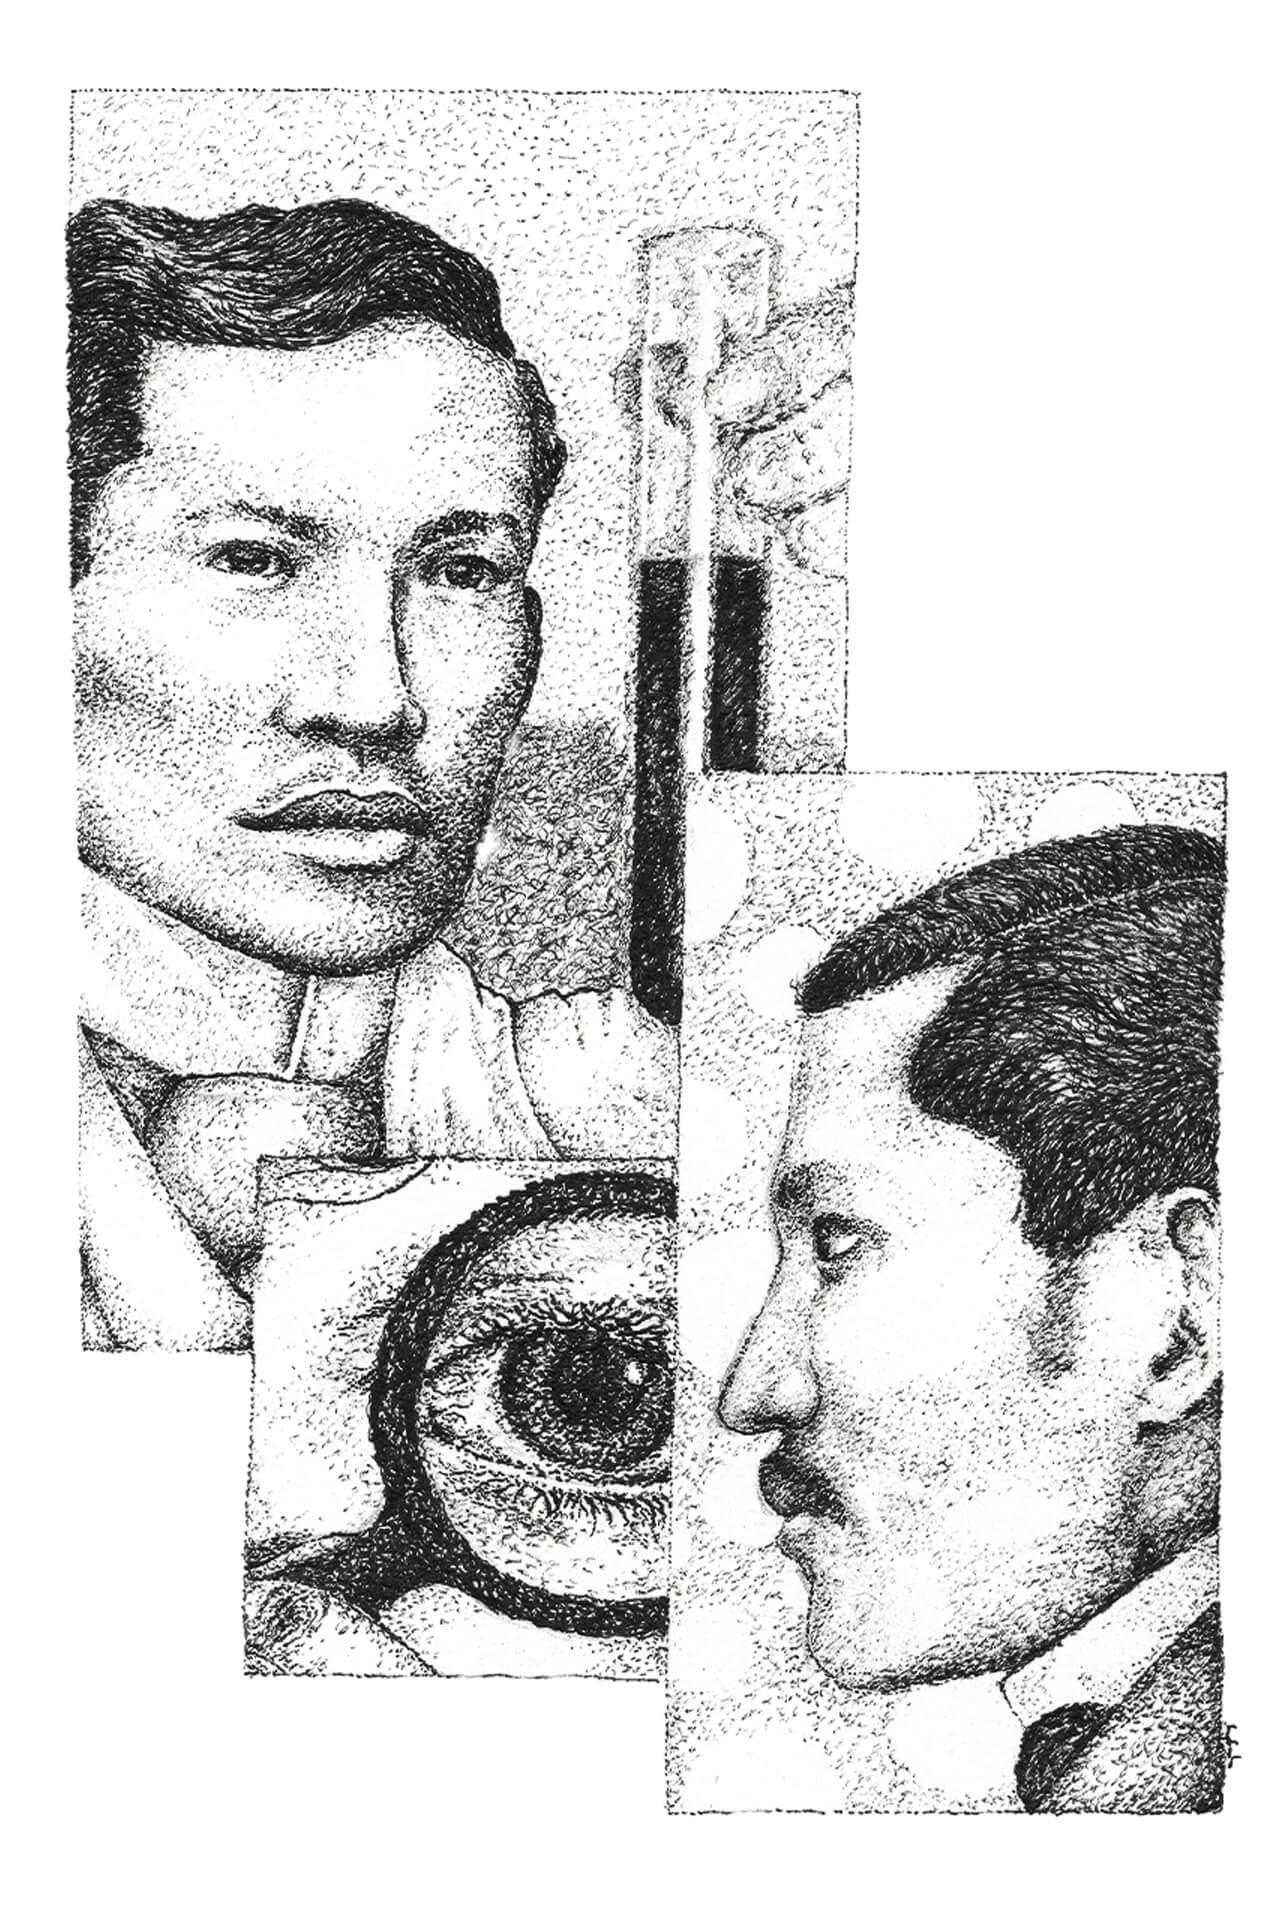 Jose Rizal Philippine National Hero, illustration by Angelo Esperanzate